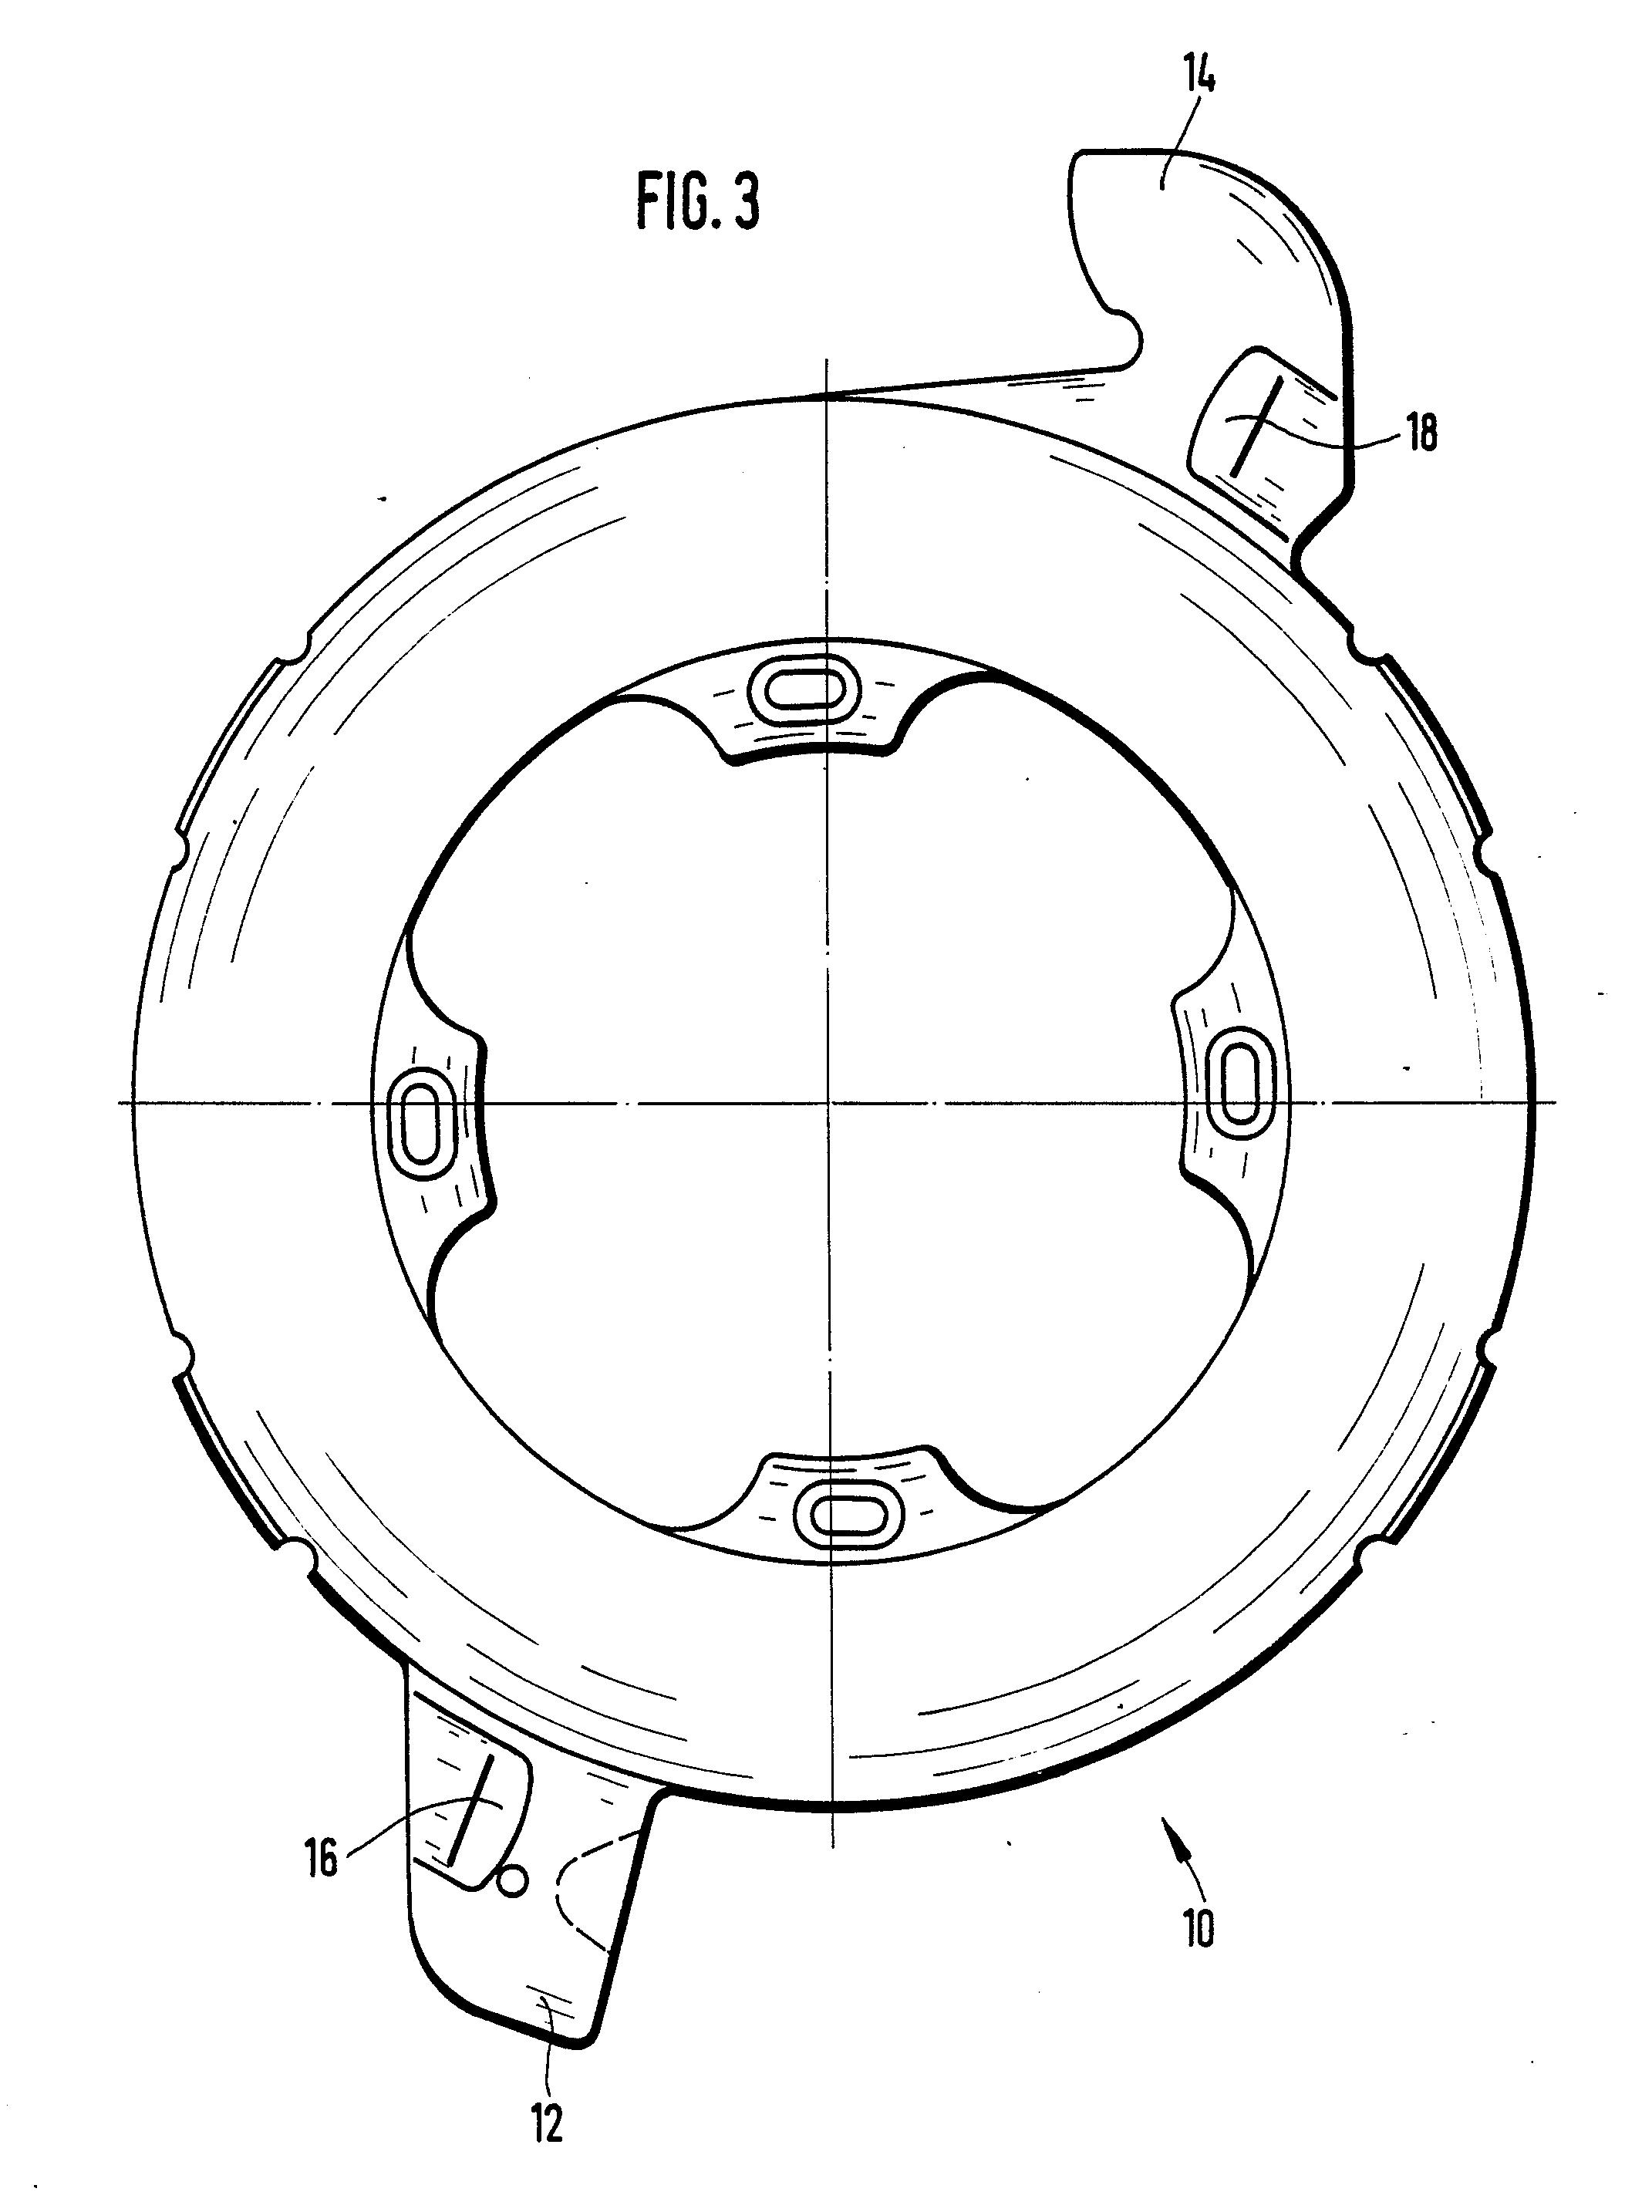 Jan Hillen Auto Electrical Wiring Diagram